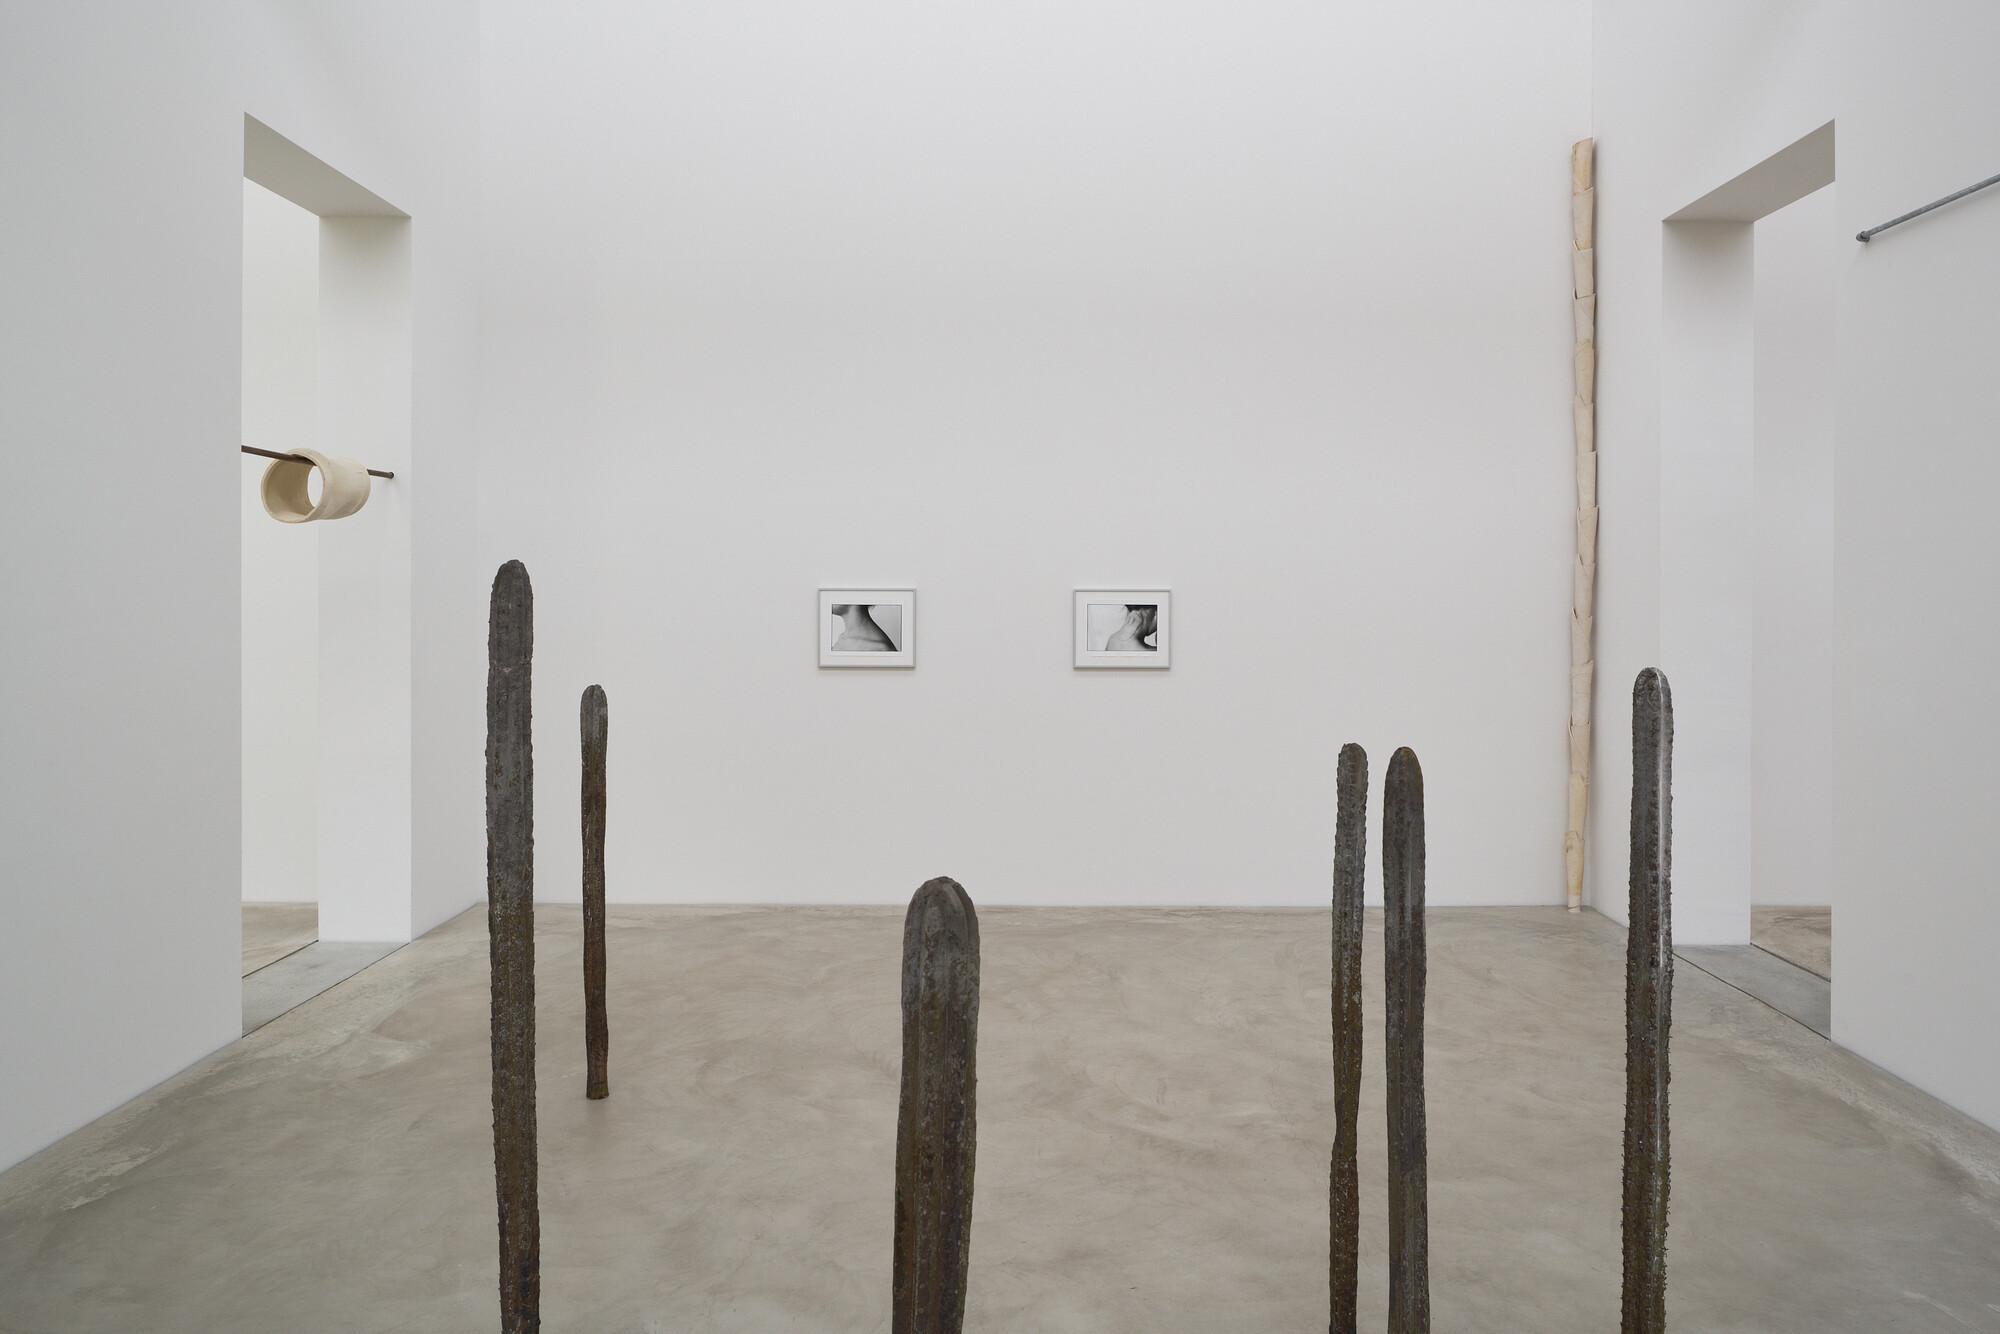 Création De Rideaux Originaux katinka bock: radio / tomorrow's sculpture - announcements